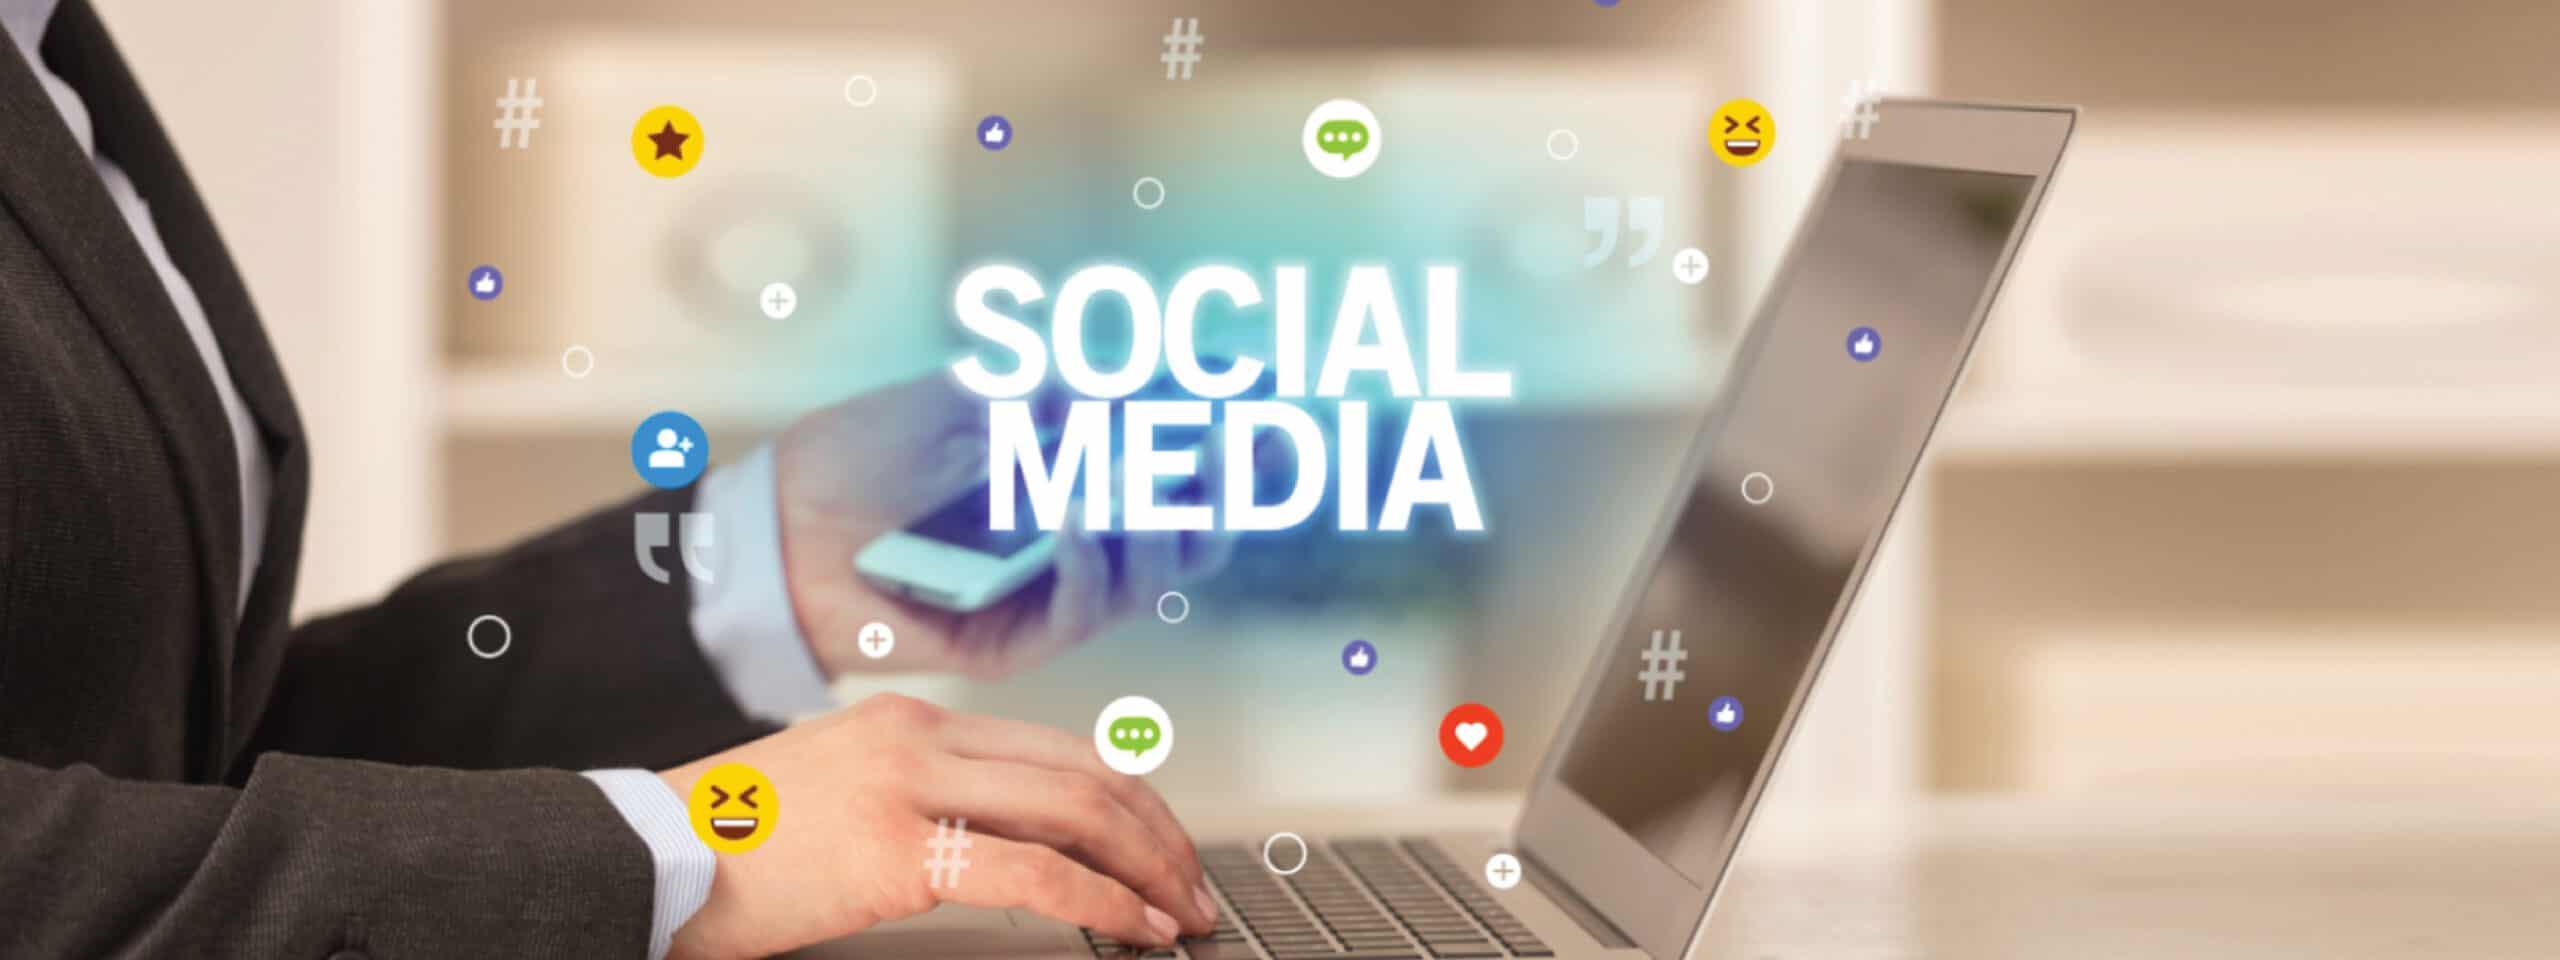 How to stay safe on social media? | Computing Australia